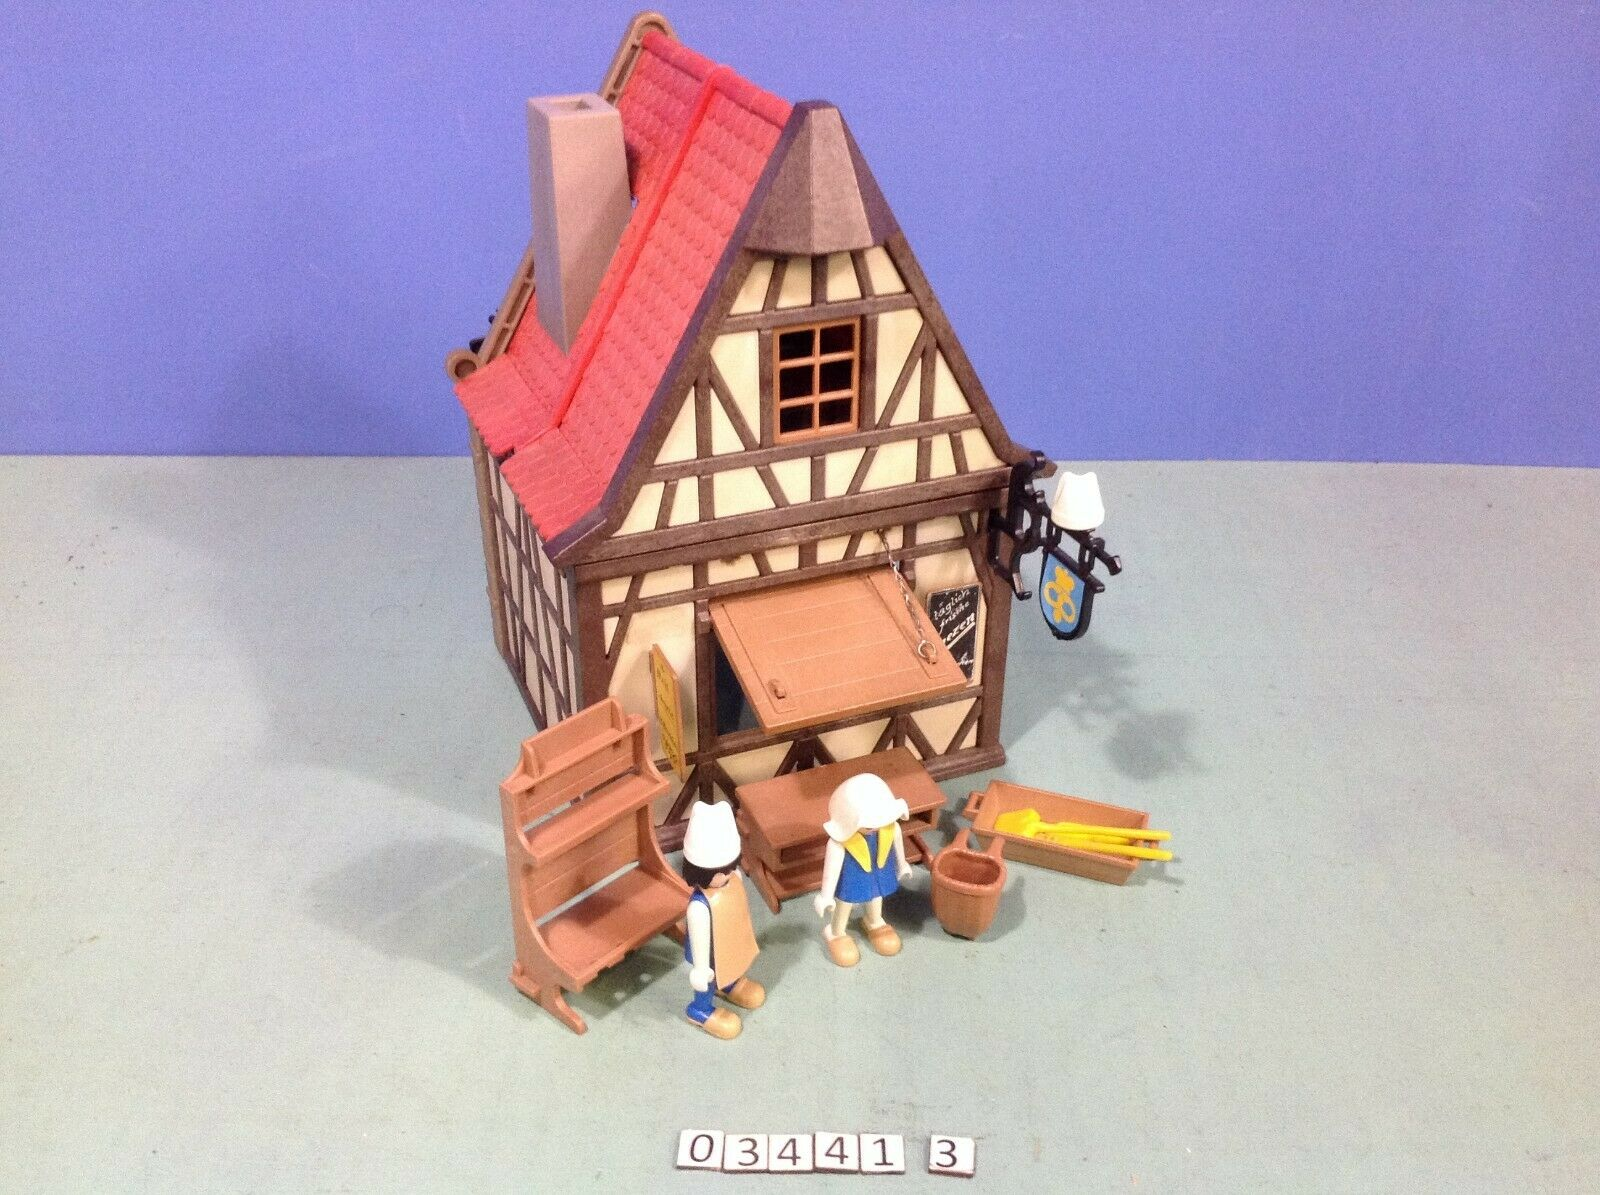 (O3441.3) playmobil boulangerie médiévale ref 3441 année 77 -  81  da non perdere!